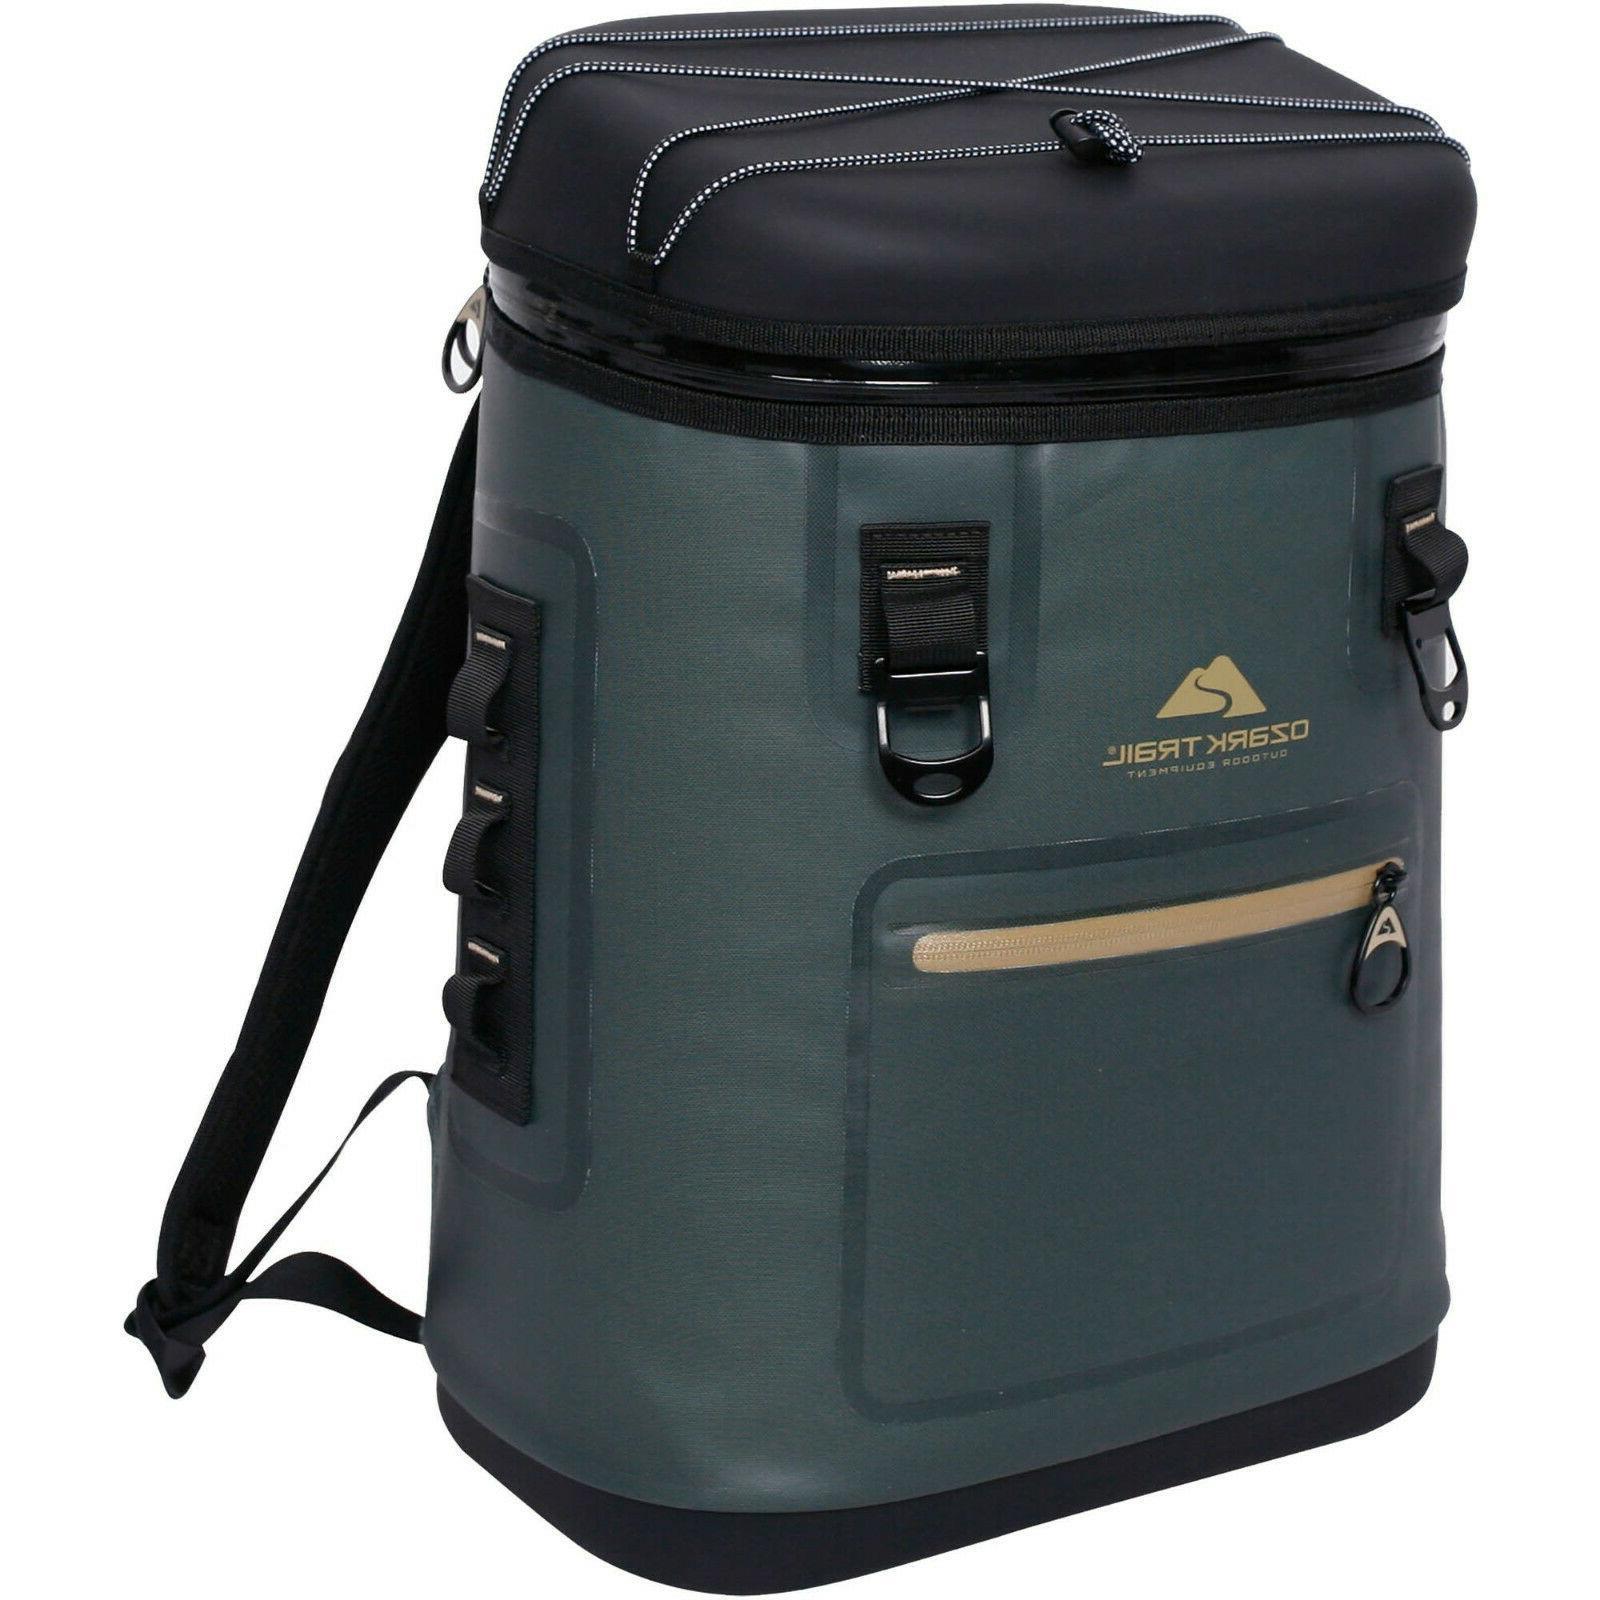 premium backpack cooler